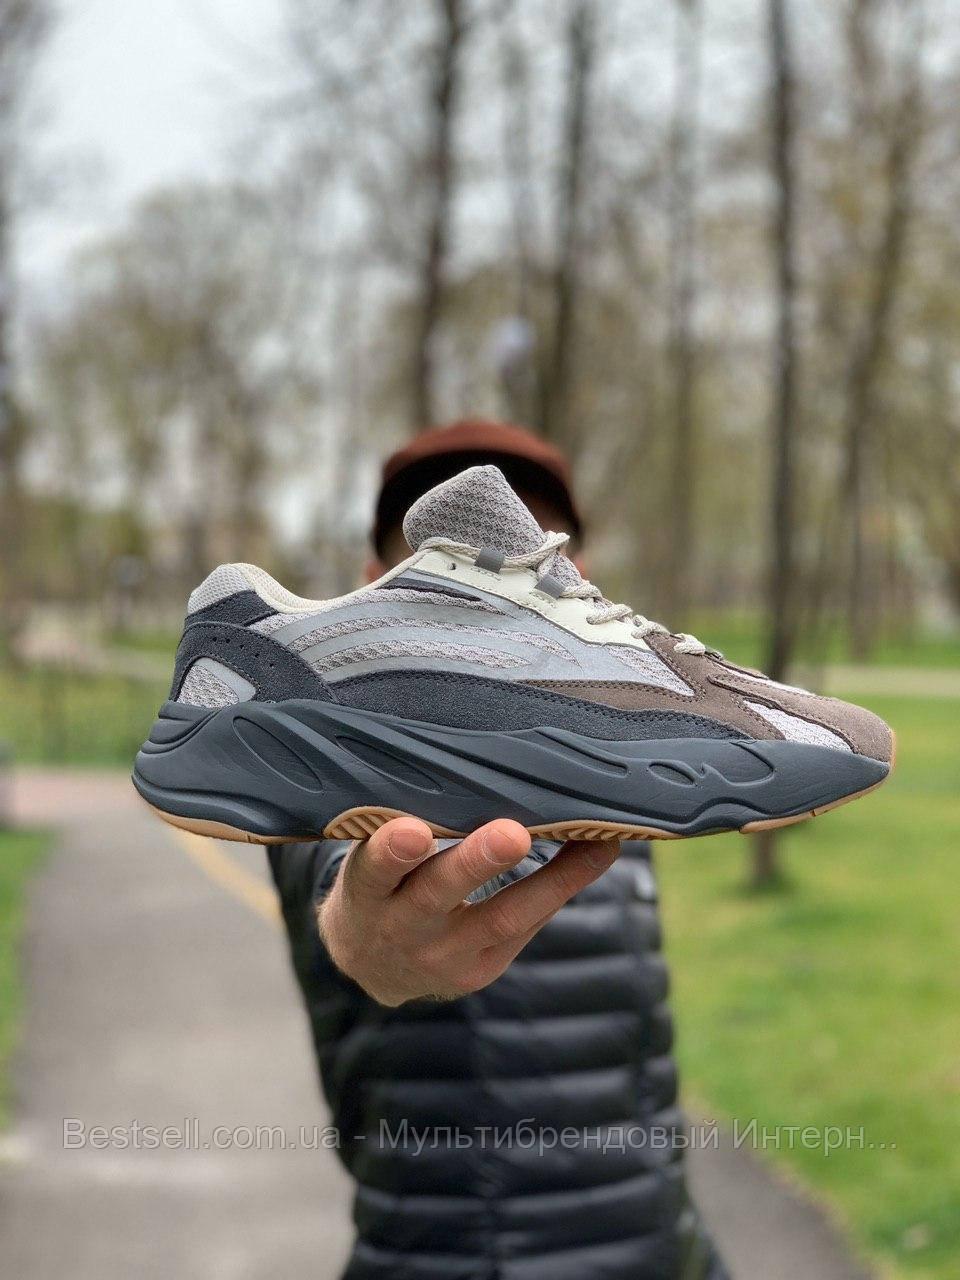 Кросівки Adidas Yeezy Boost 700 Адідас Ізі Буст (44,45)